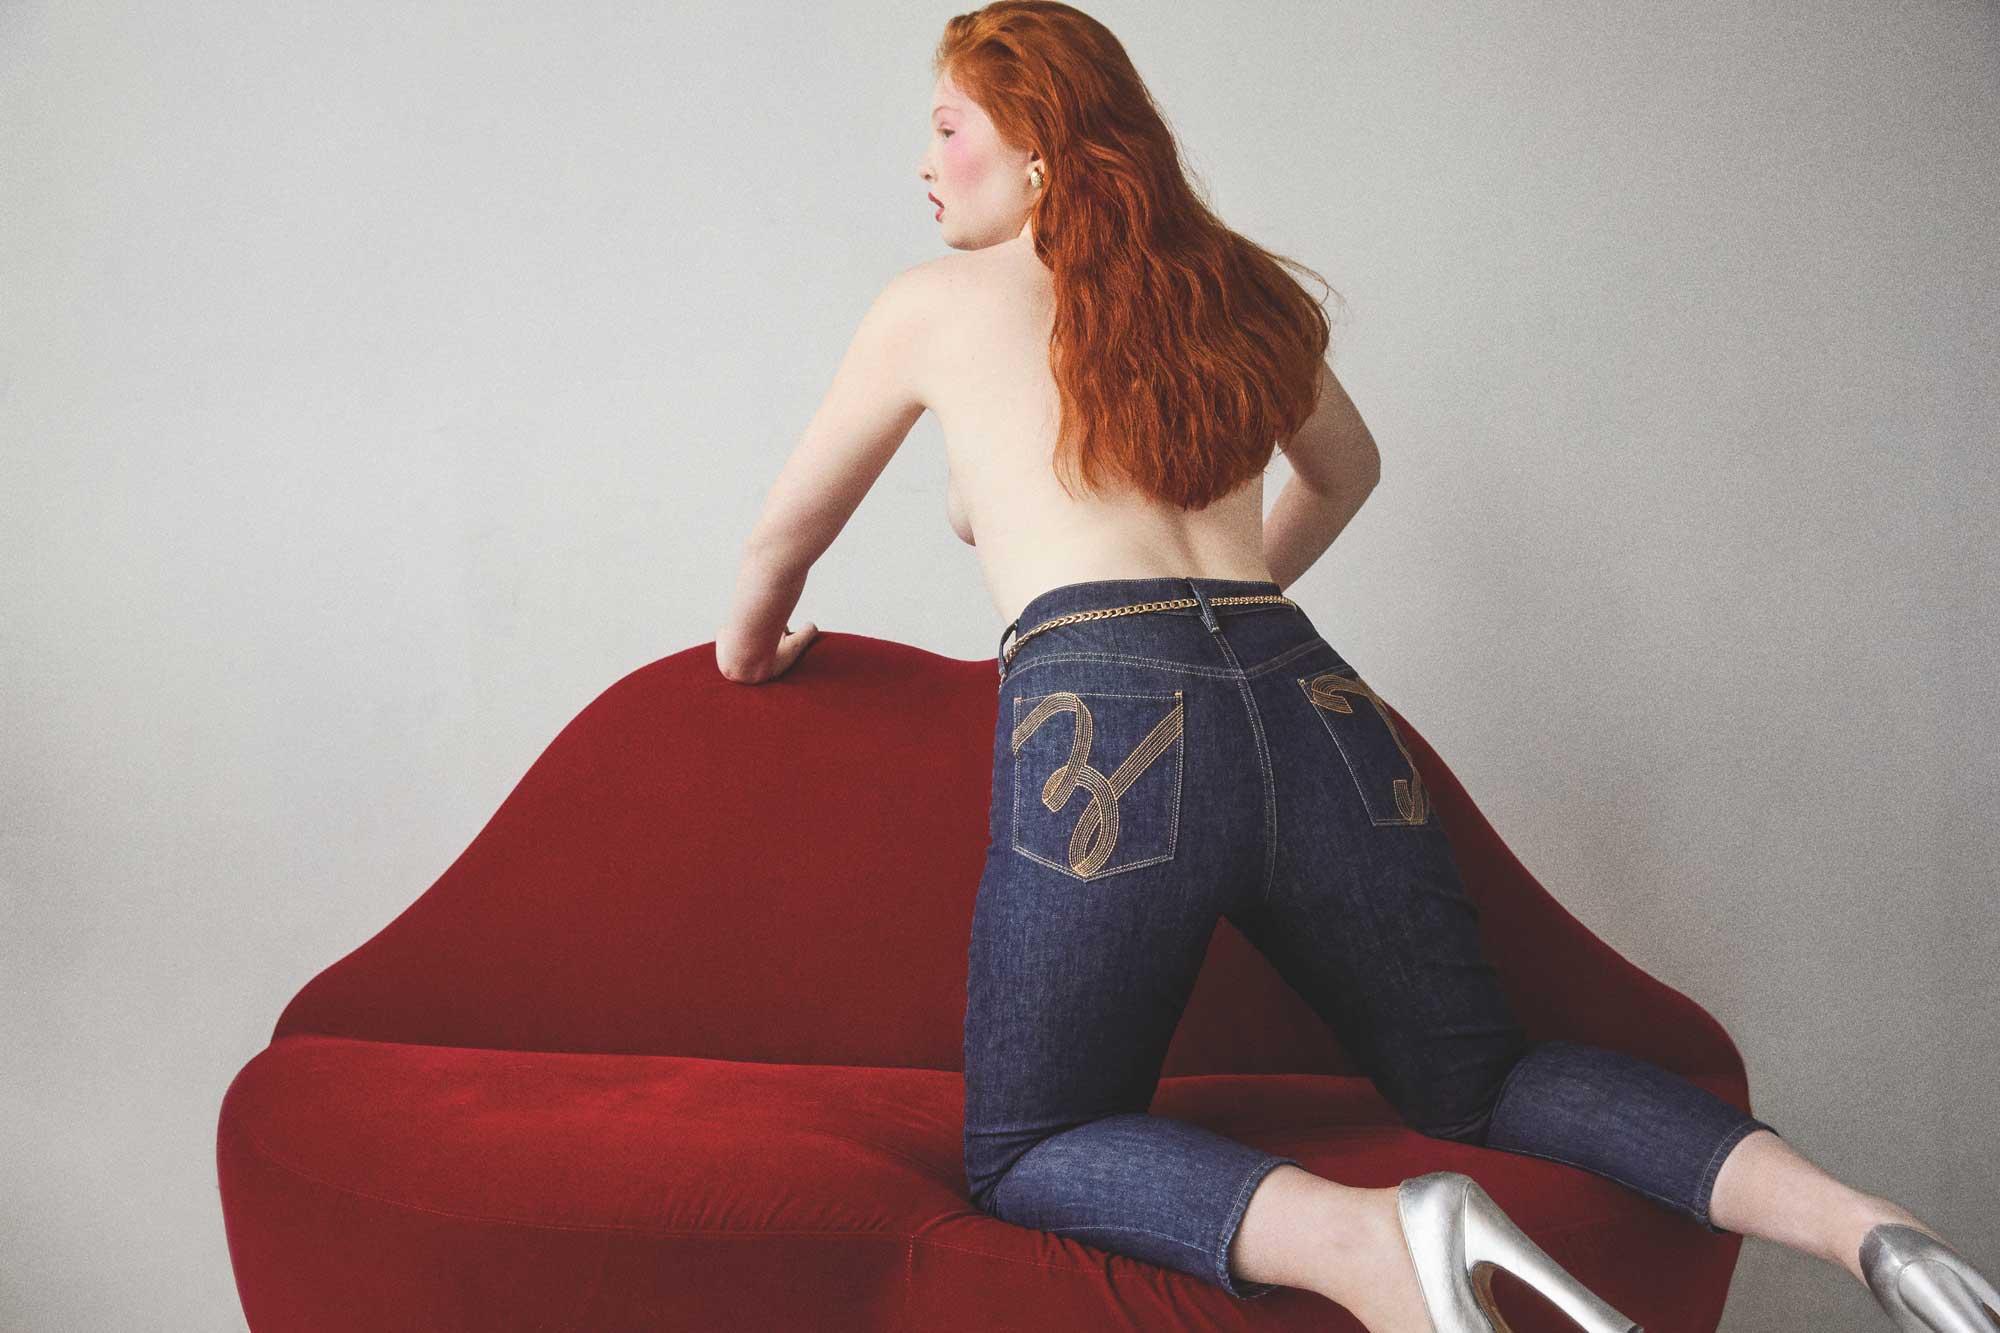 Tess McMillan pour TOMMYXZENDAYA collection.